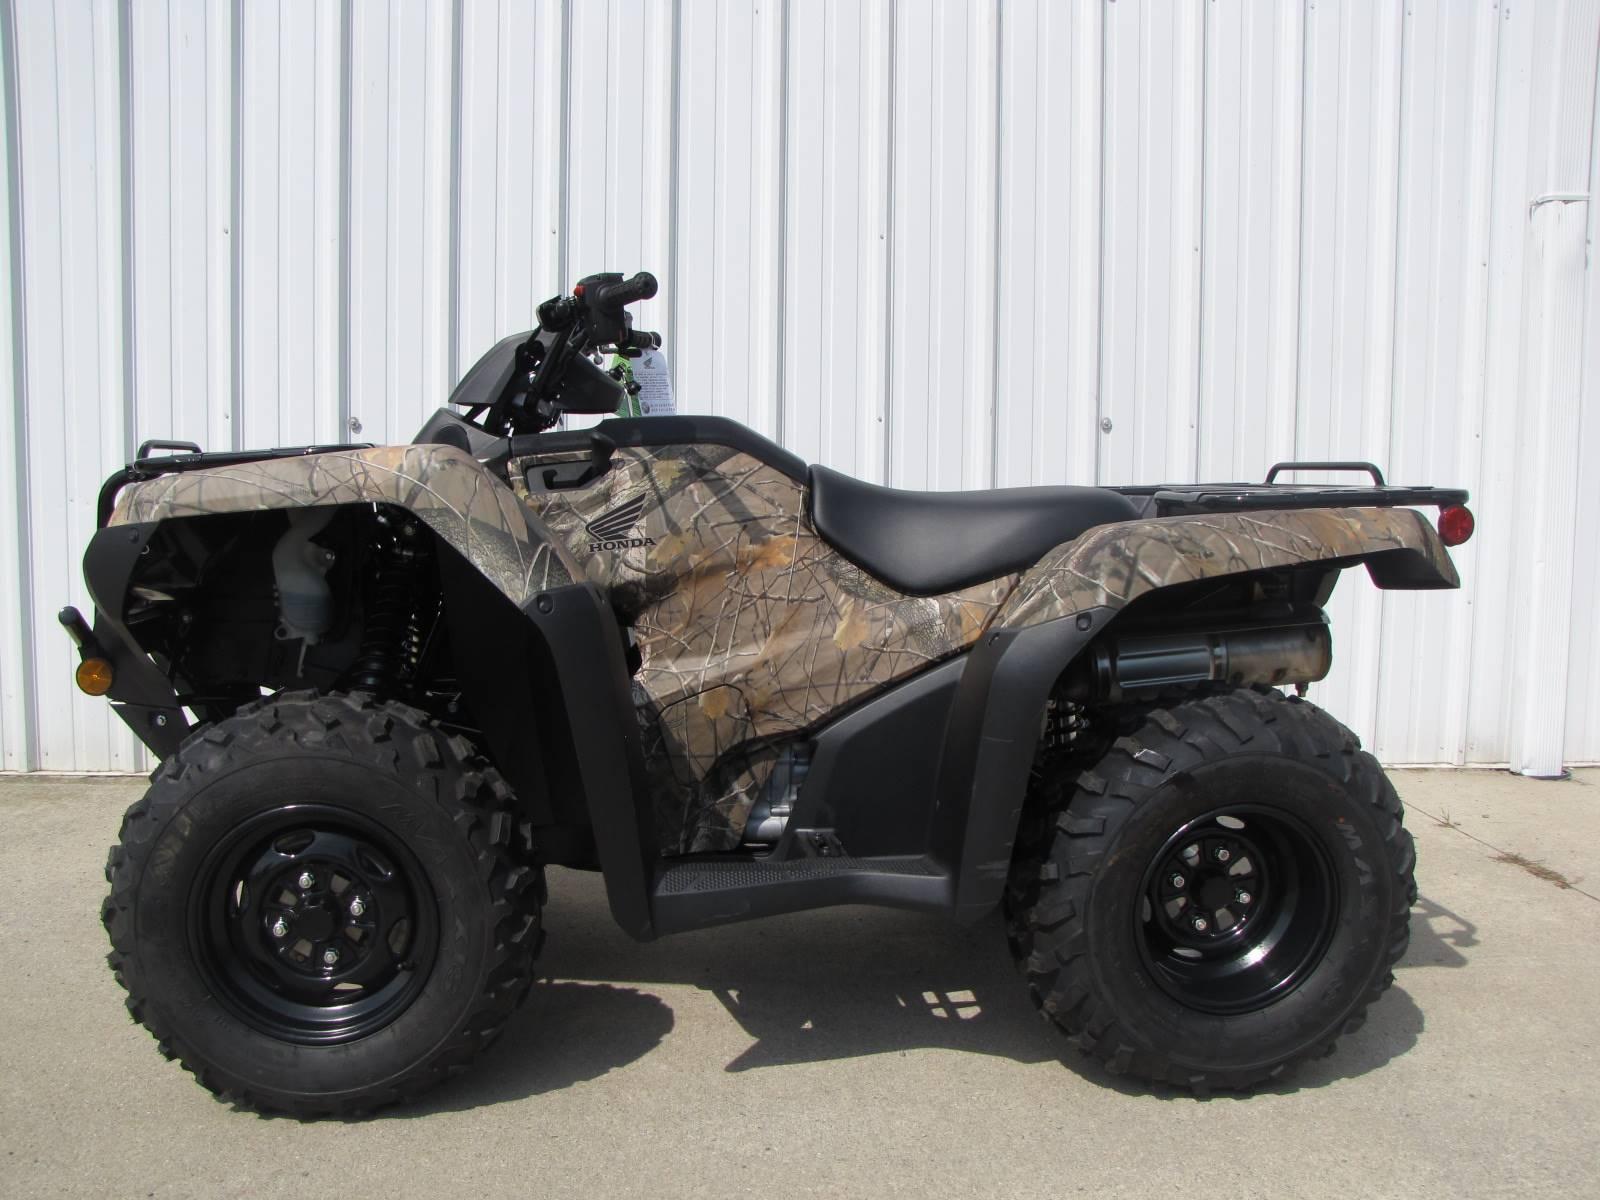 2020 FourTrax Rancher 4x4 ES